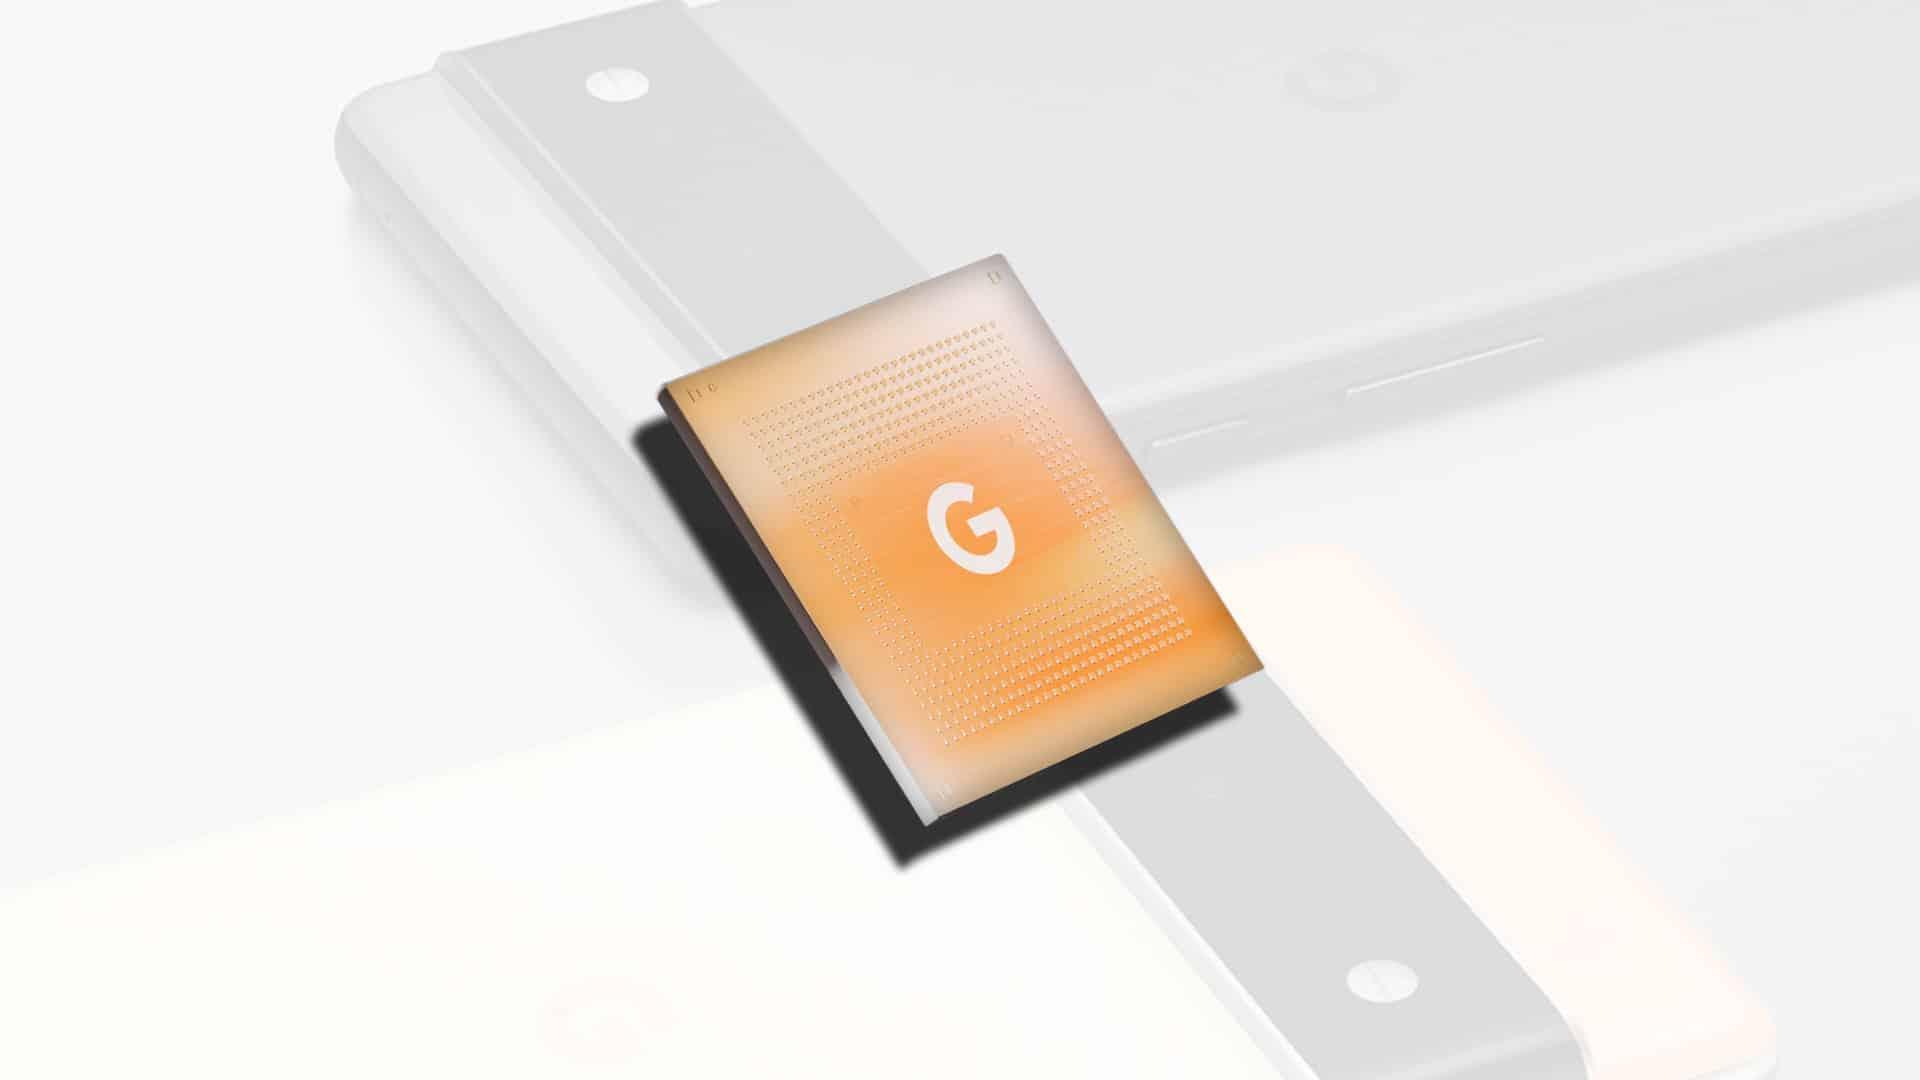 Google chips